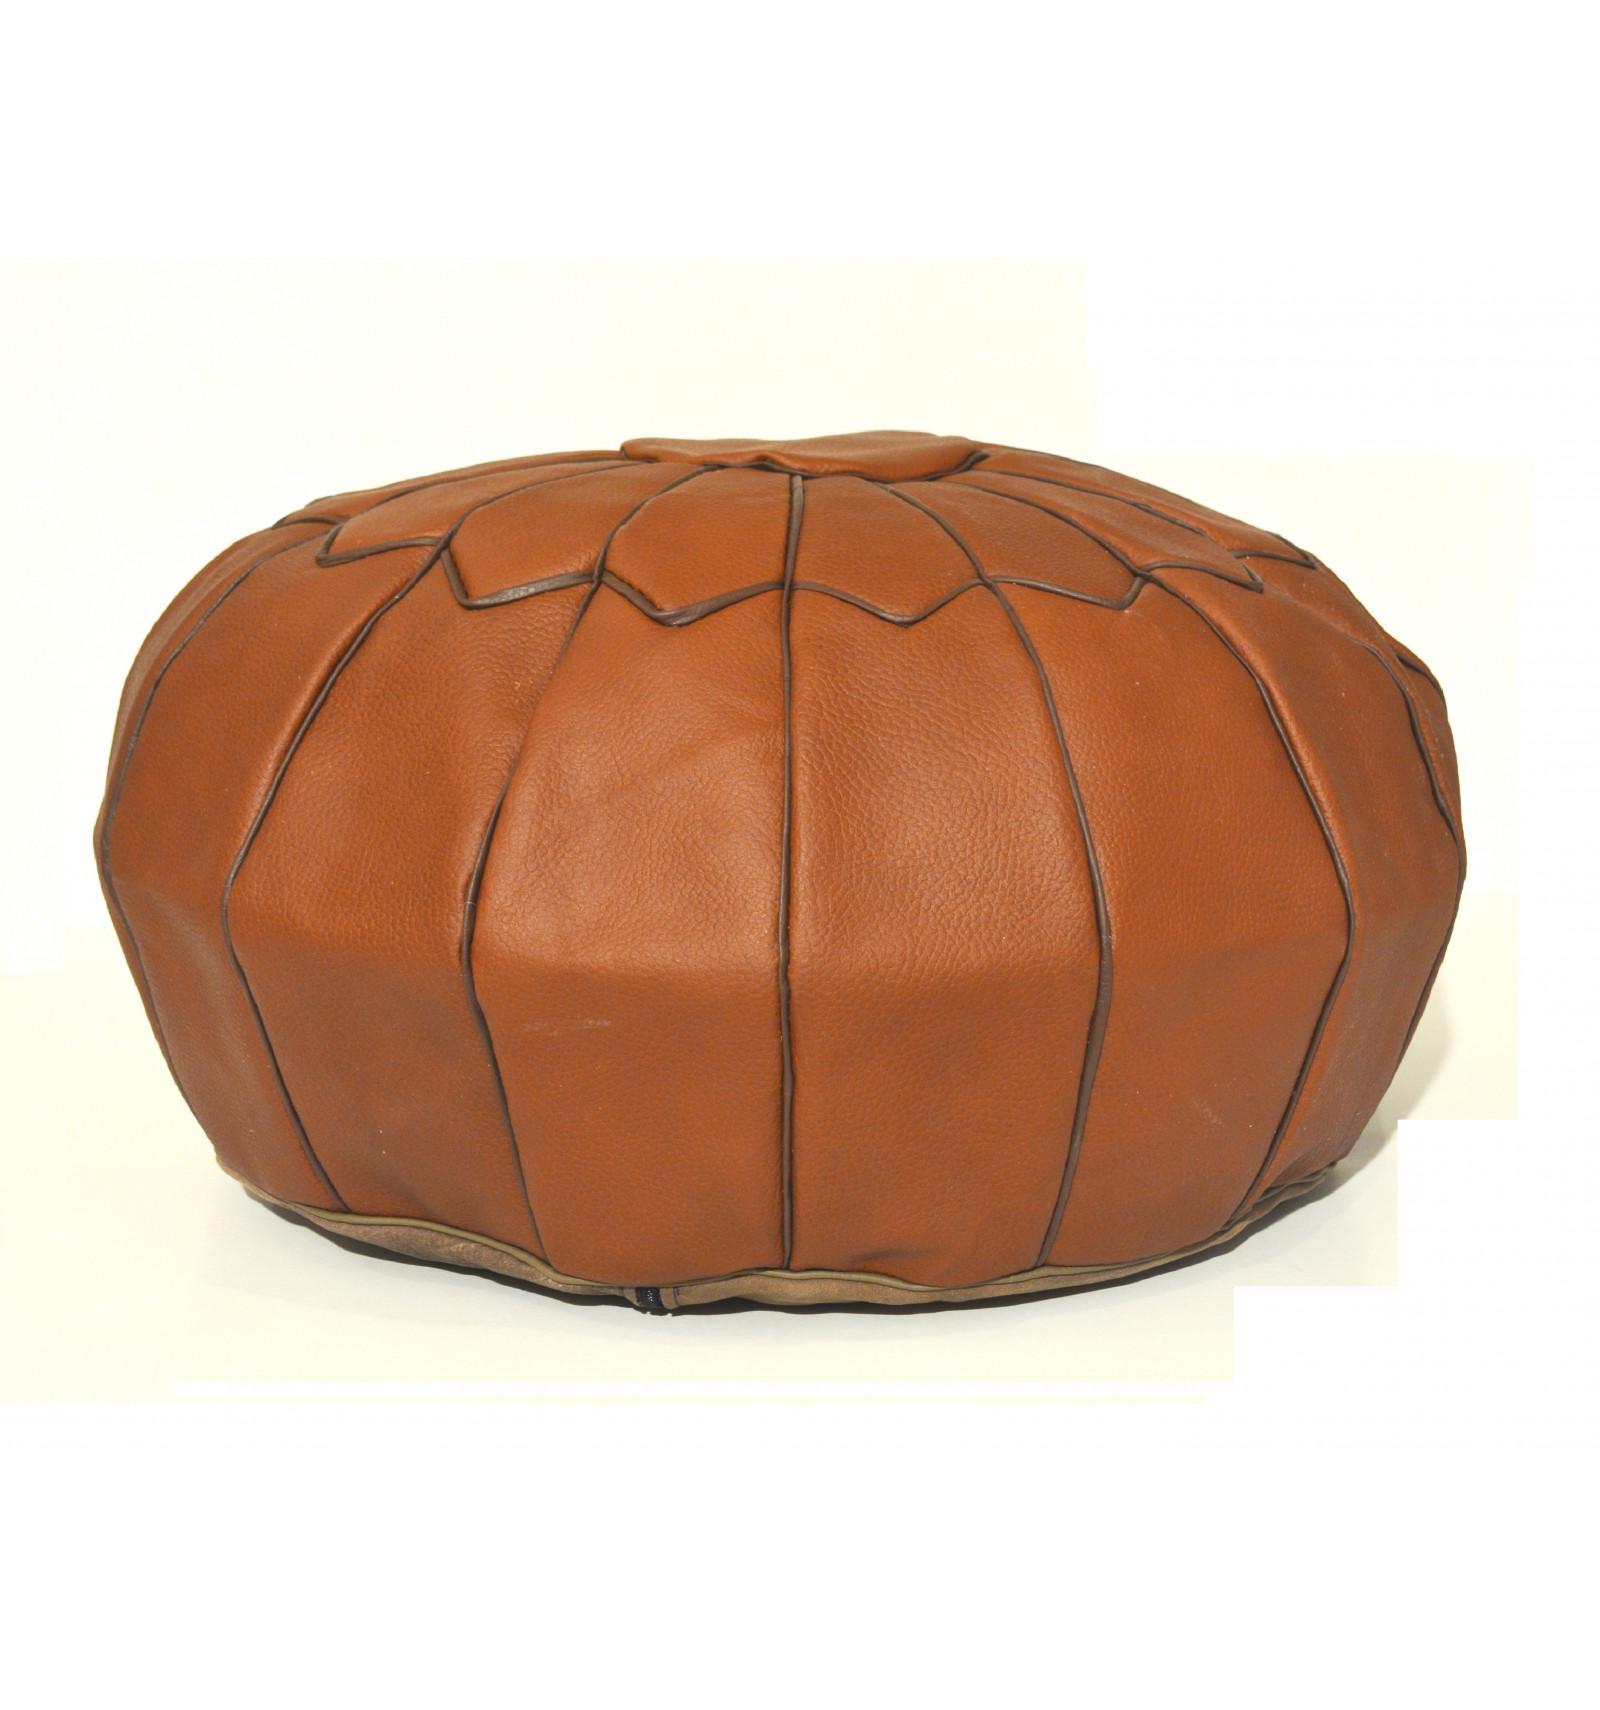 design pouf pouf marocain en cuir marron lartisanet. Black Bedroom Furniture Sets. Home Design Ideas